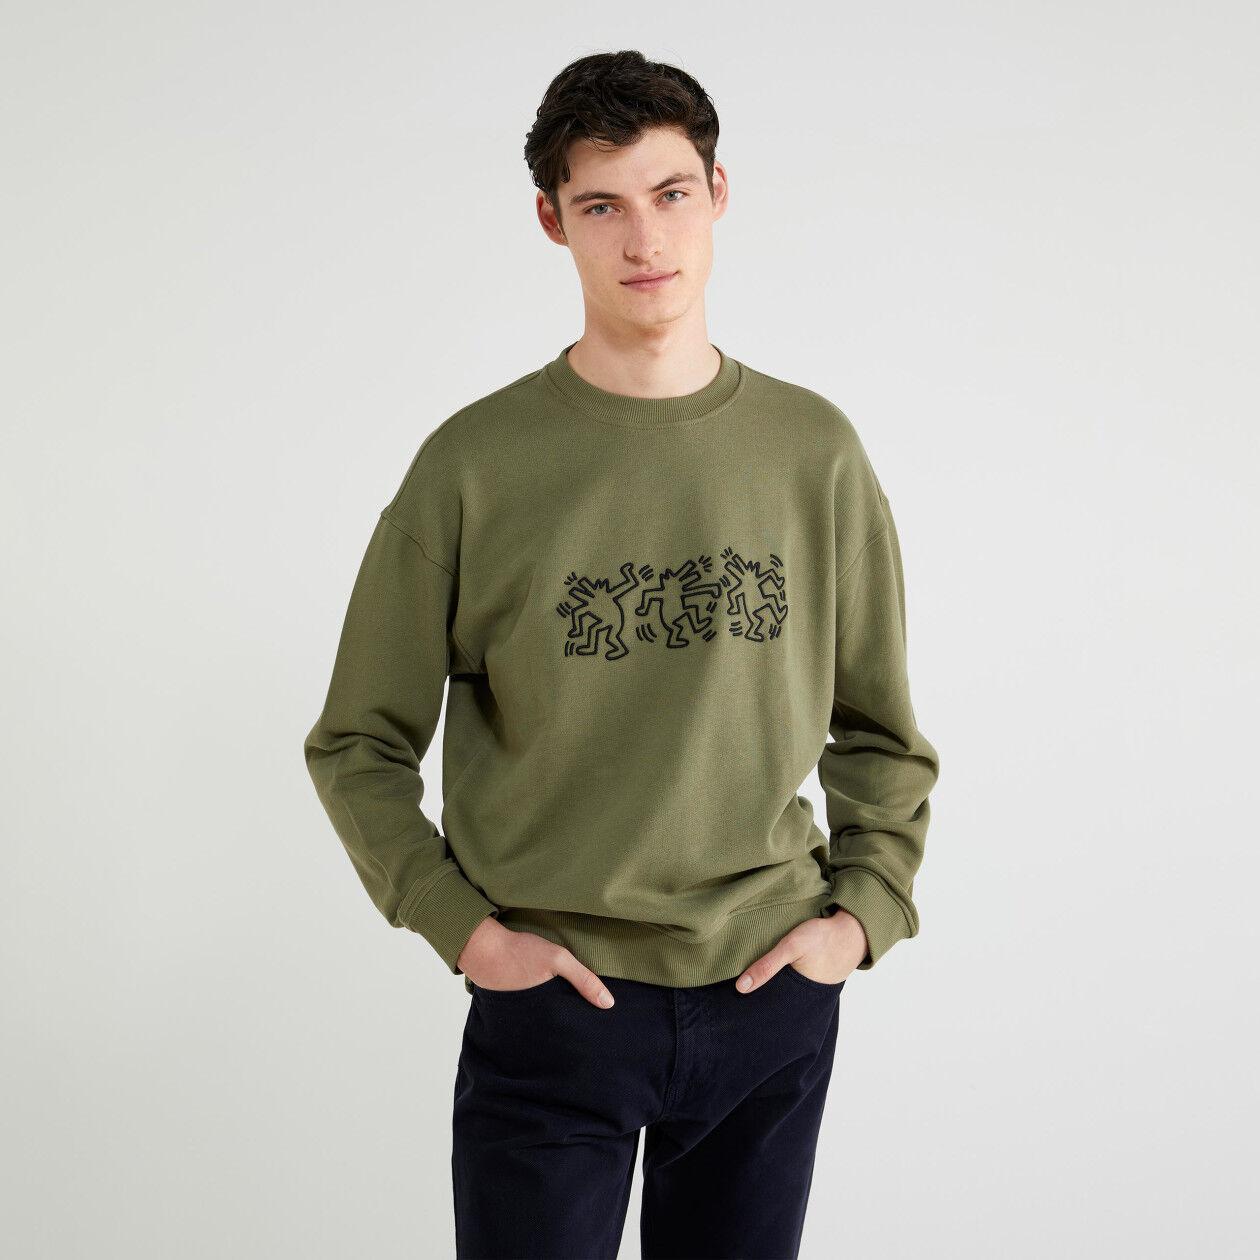 """Keith Haring"" crew neck sweatshirt"